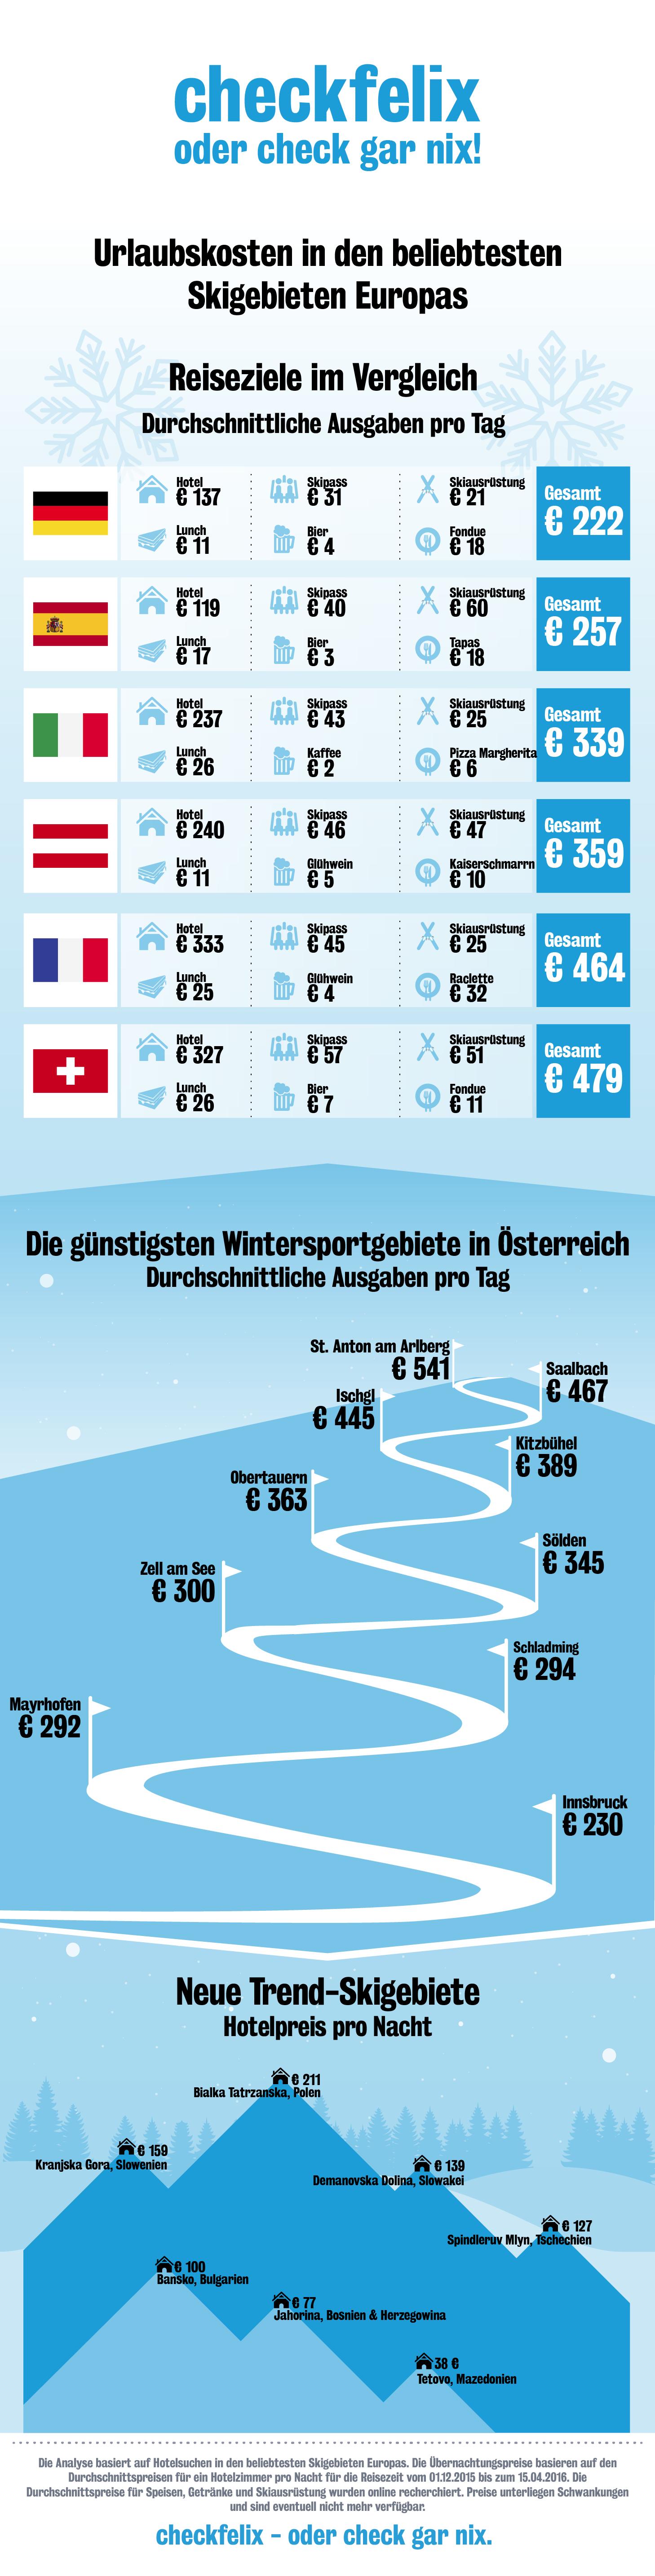 Preise in den beliebtesten Skigebieten Europas - Infografik